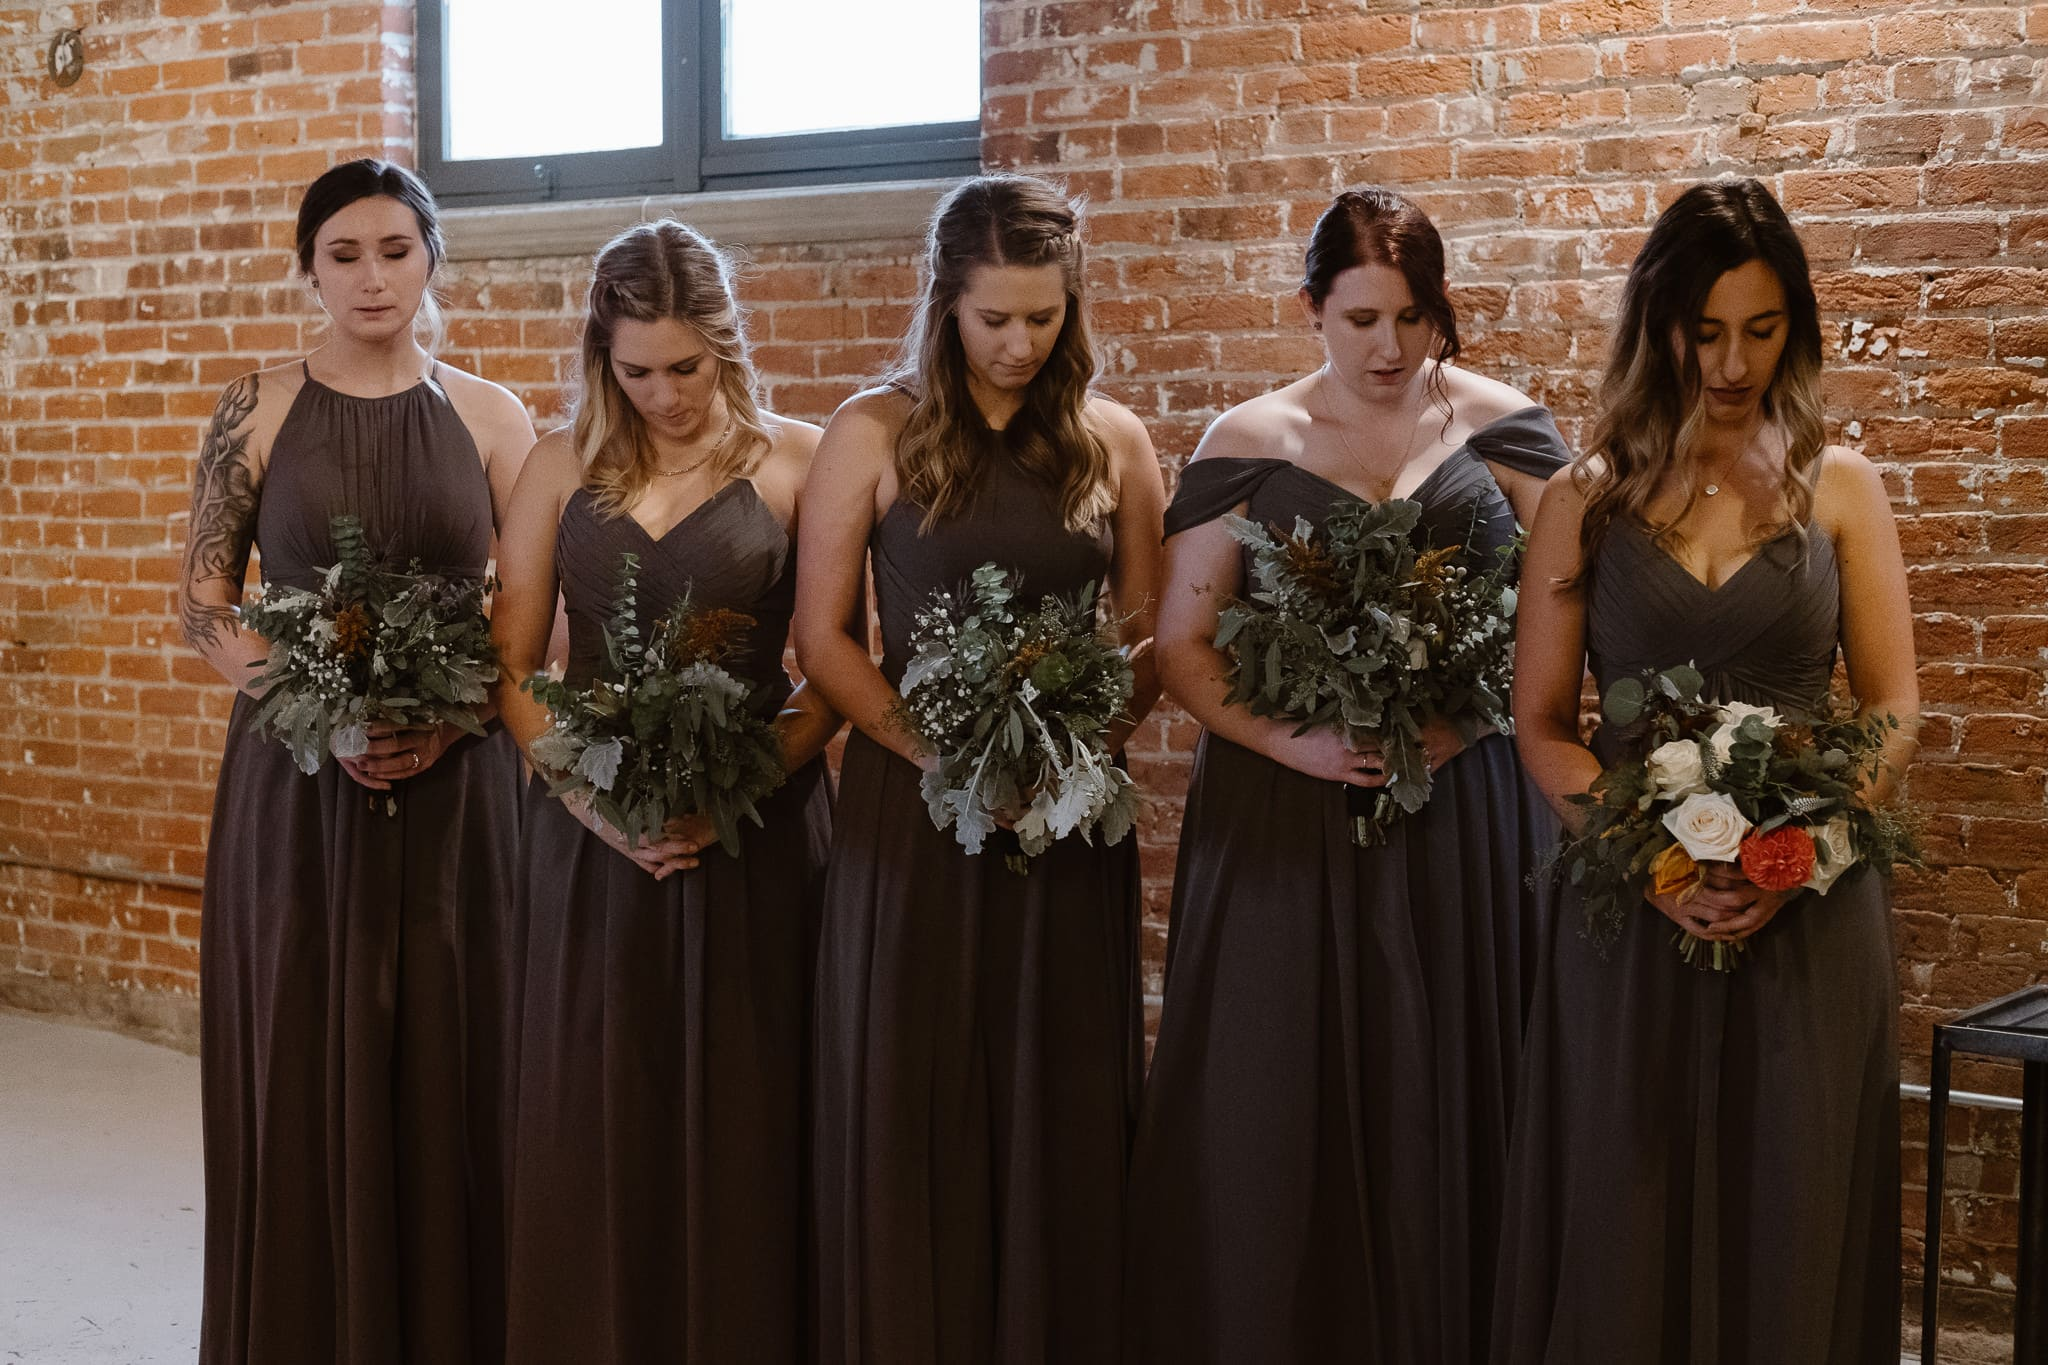 St Vrain Wedding Photographer | Longmont Wedding Photographer | Colorado Winter Wedding Photographer, Colorado industrial chic wedding ceremony, bridesmaids in dark gray dresses